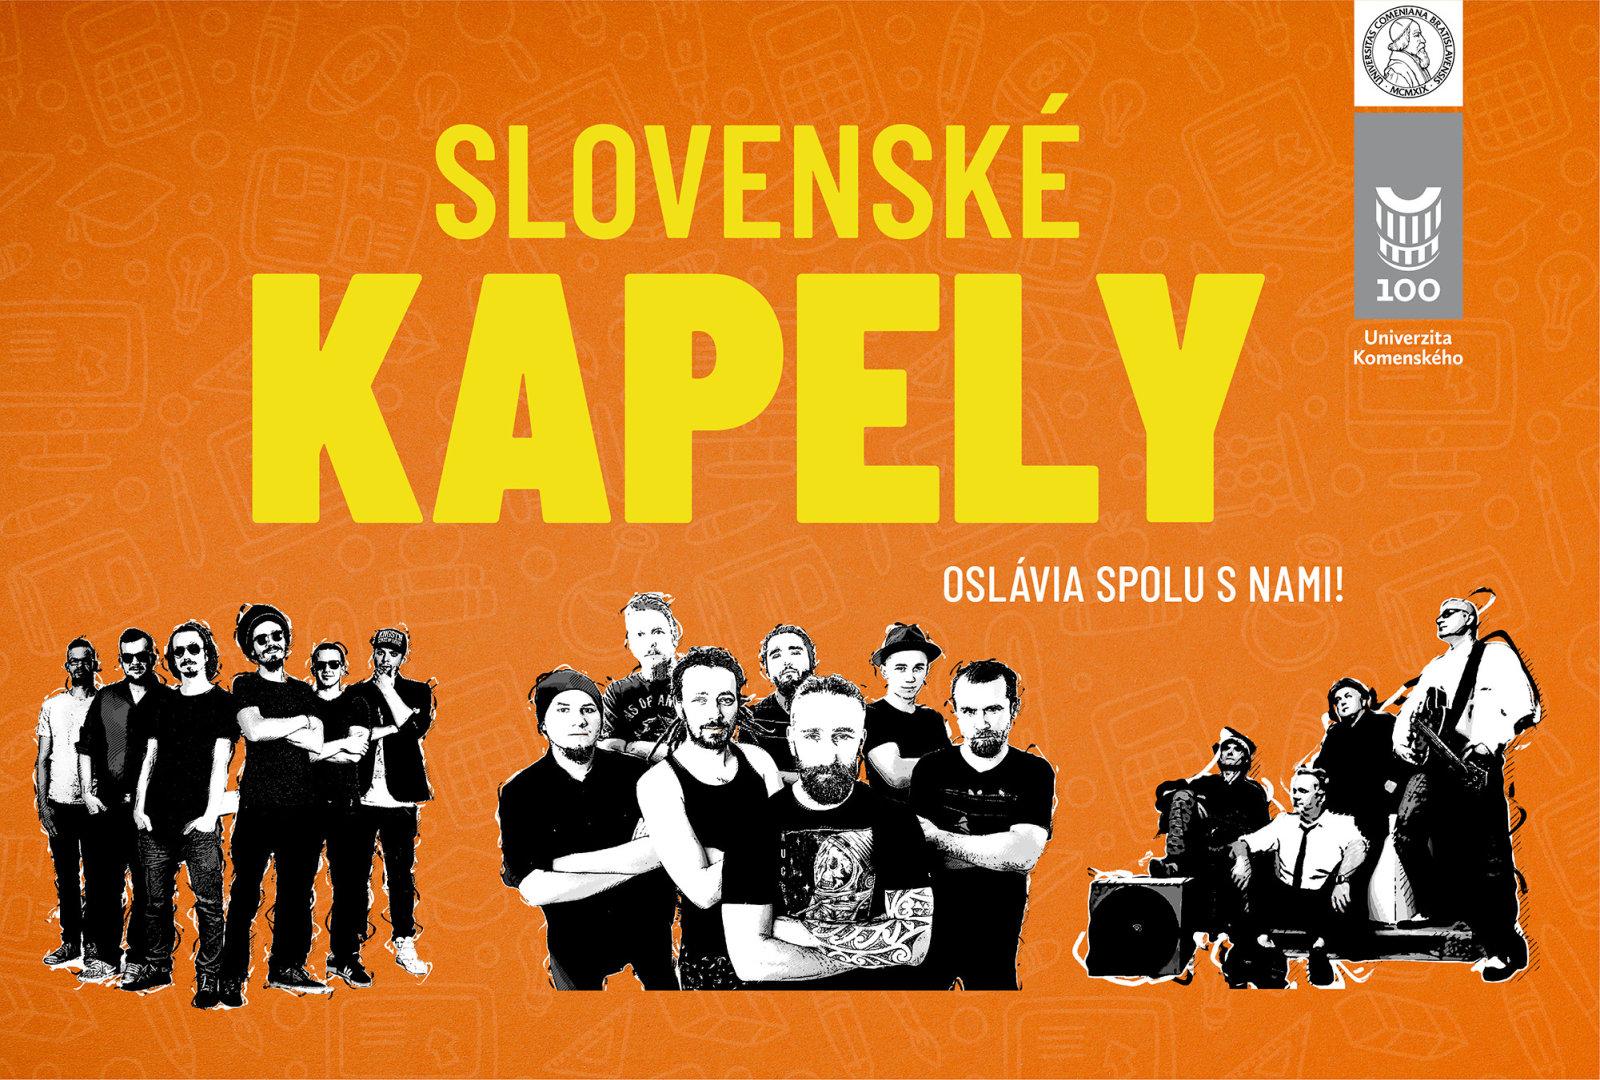 Nebudú chýbať ani TOP slovenské kapely!